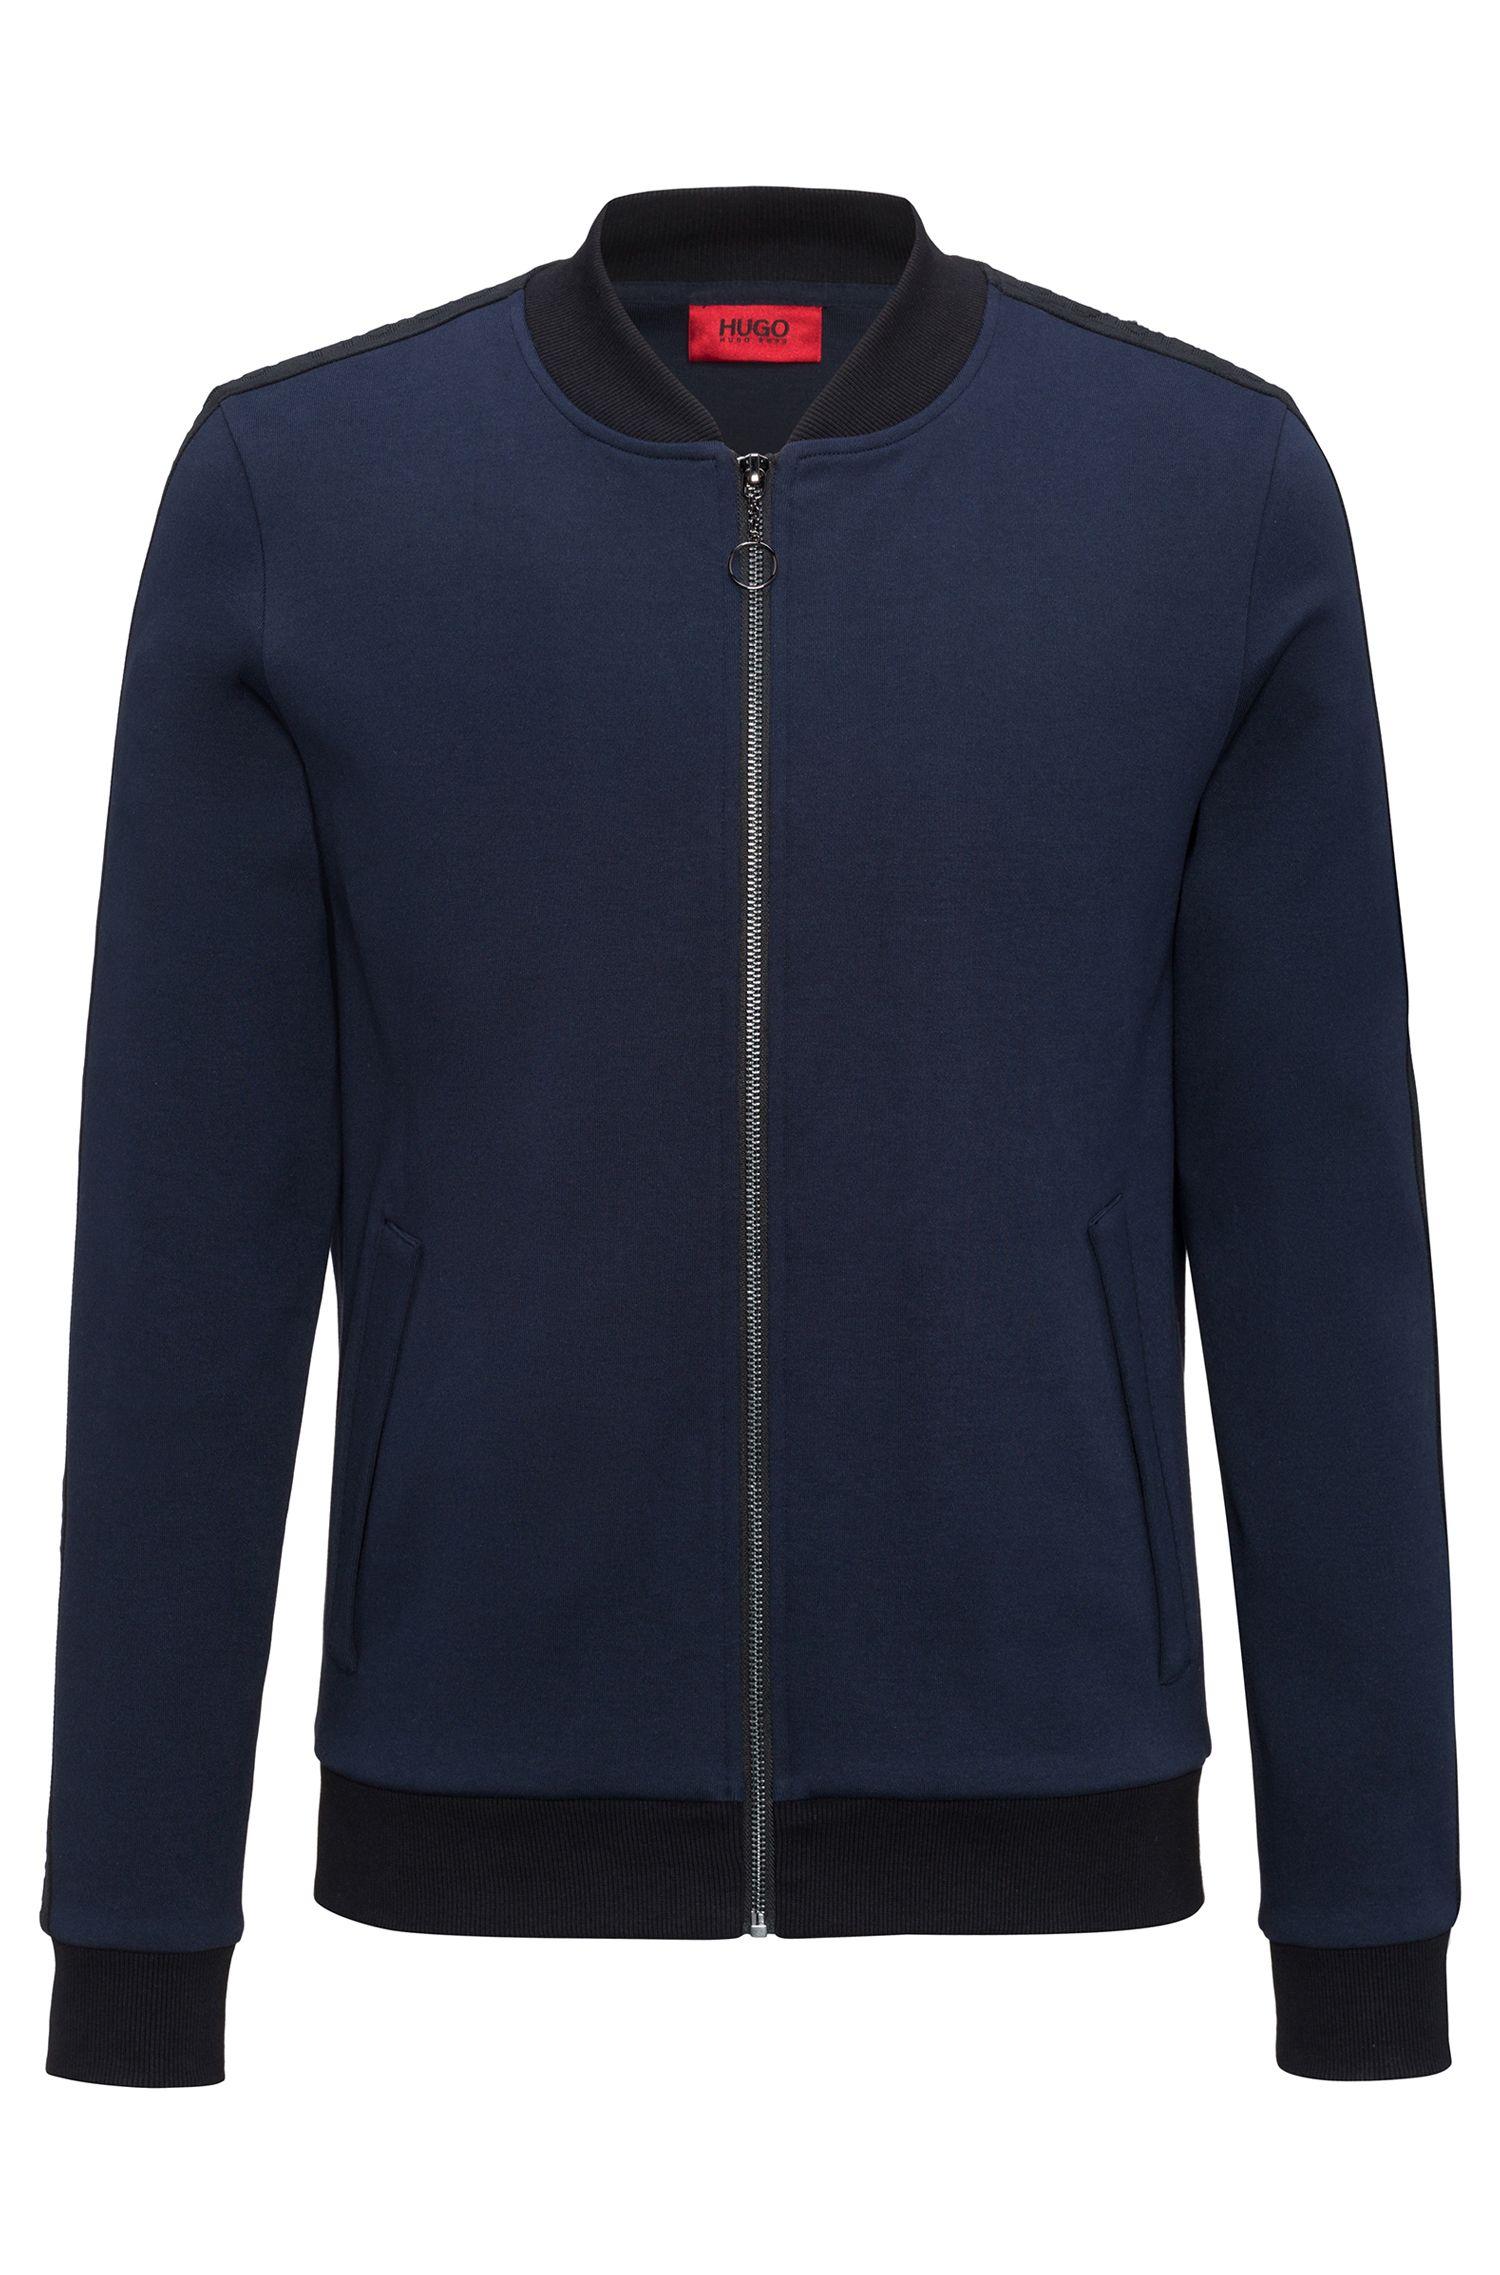 Cotton Full-Zip Sweat Jacket | Dacido